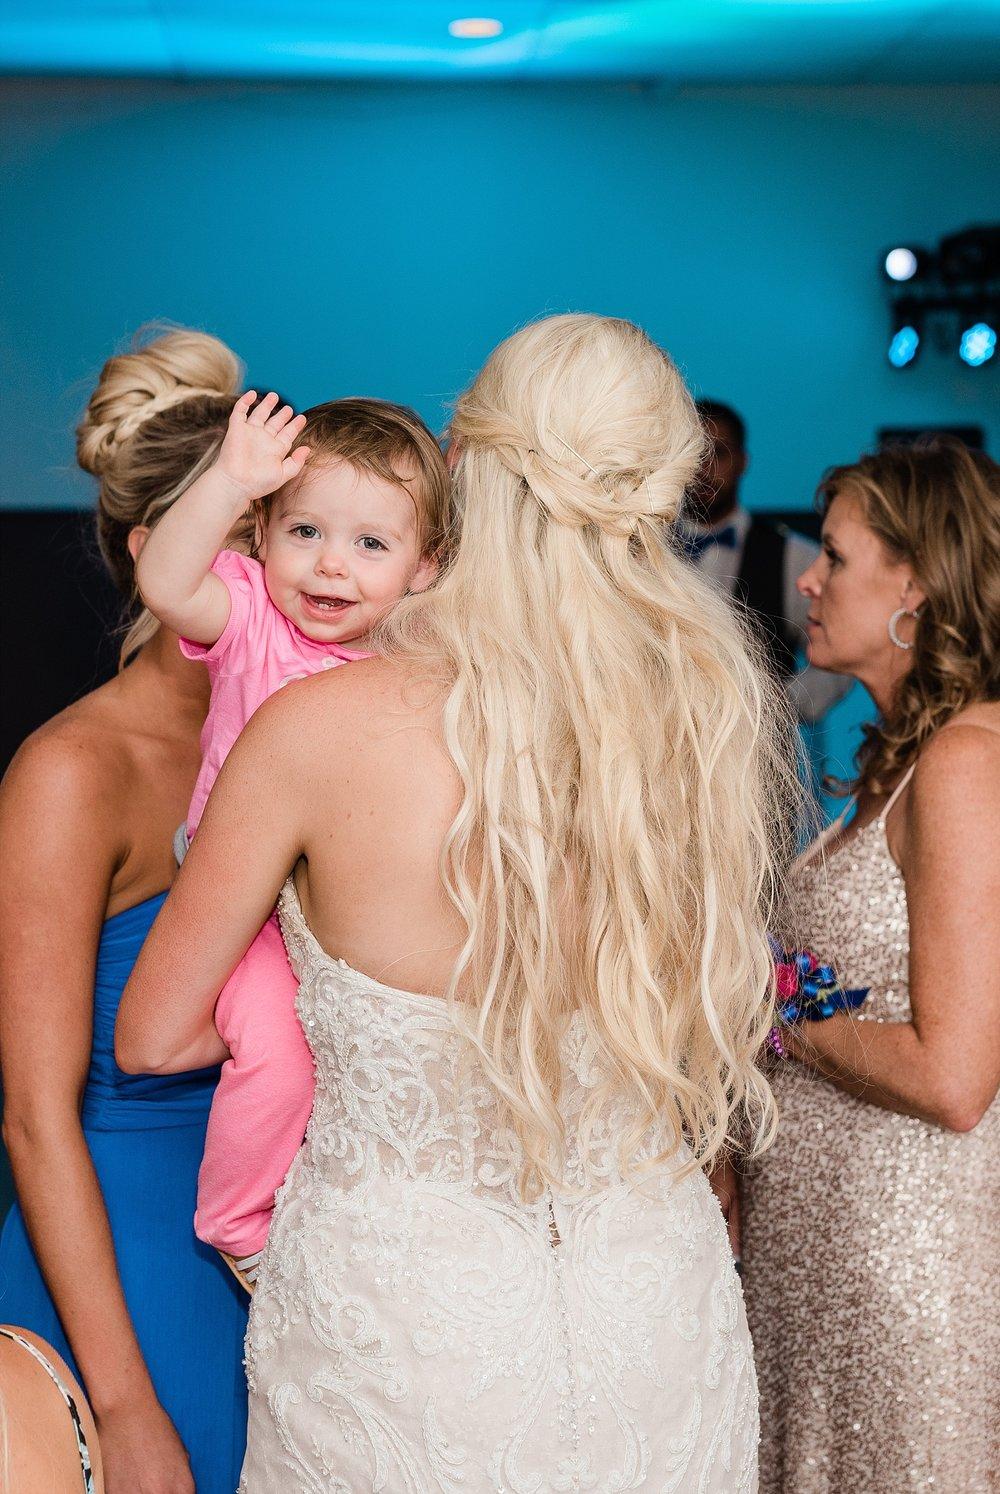 Alan and Heather Horn Wedding by Kelsi Kliethermes Photography Associate - Rachel_0047.jpg